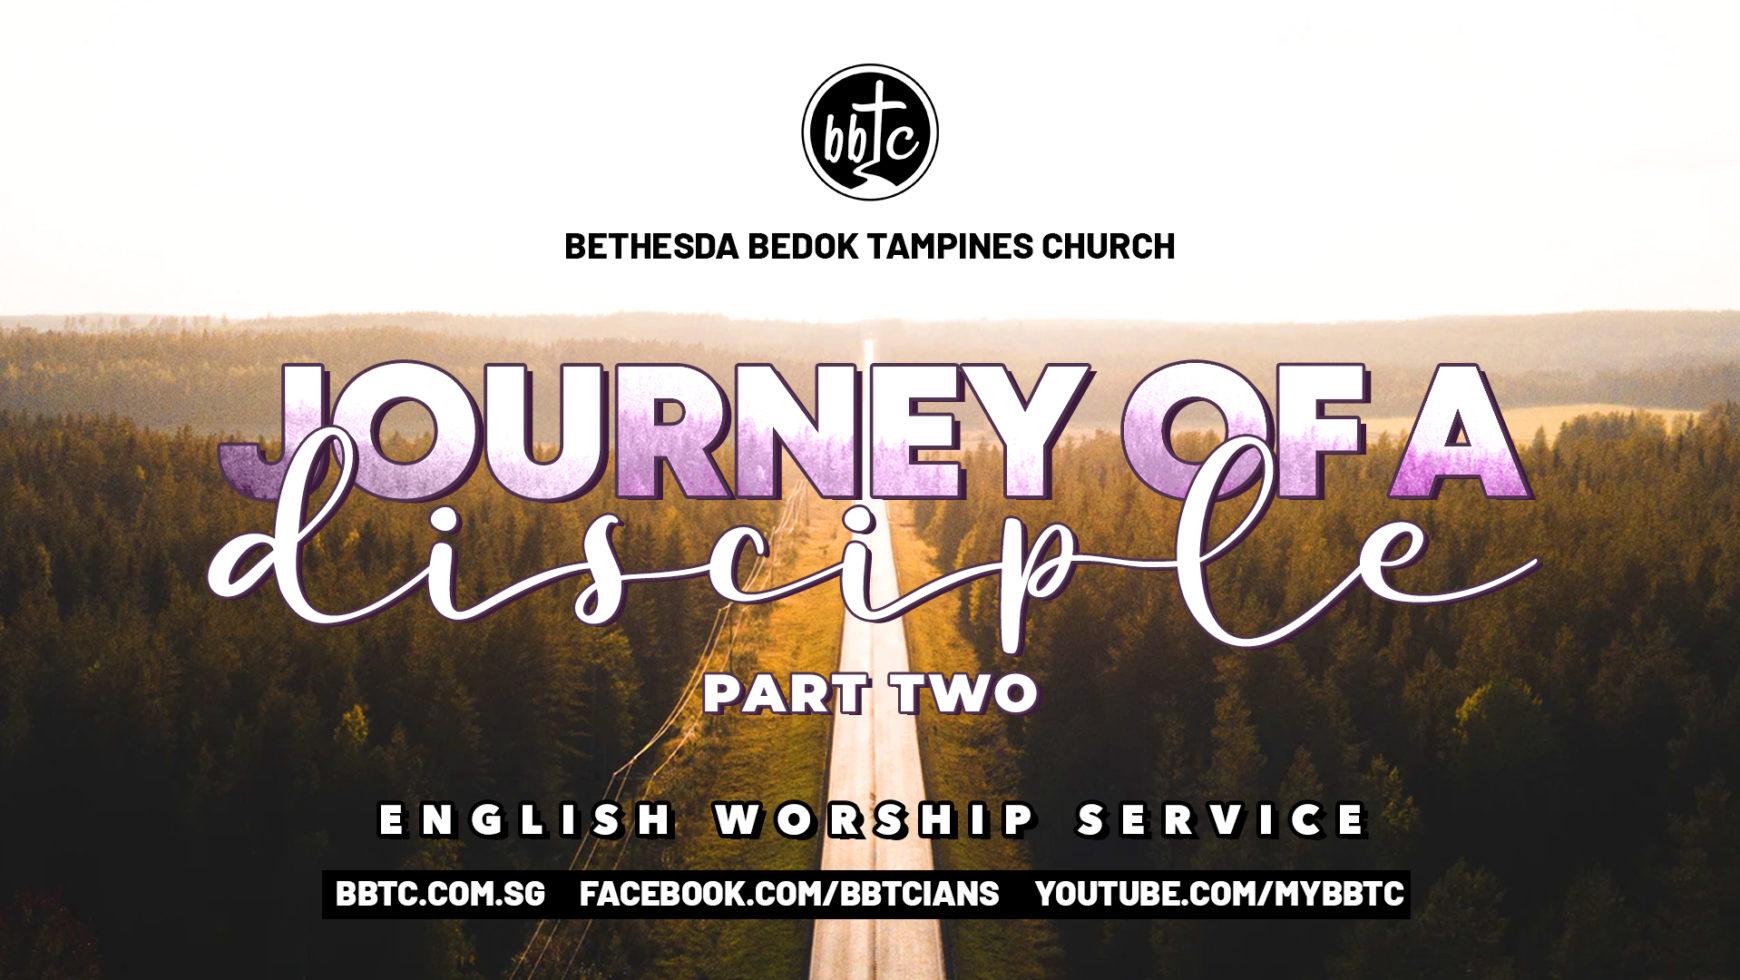 Journey Of A Disciple (Part 2)